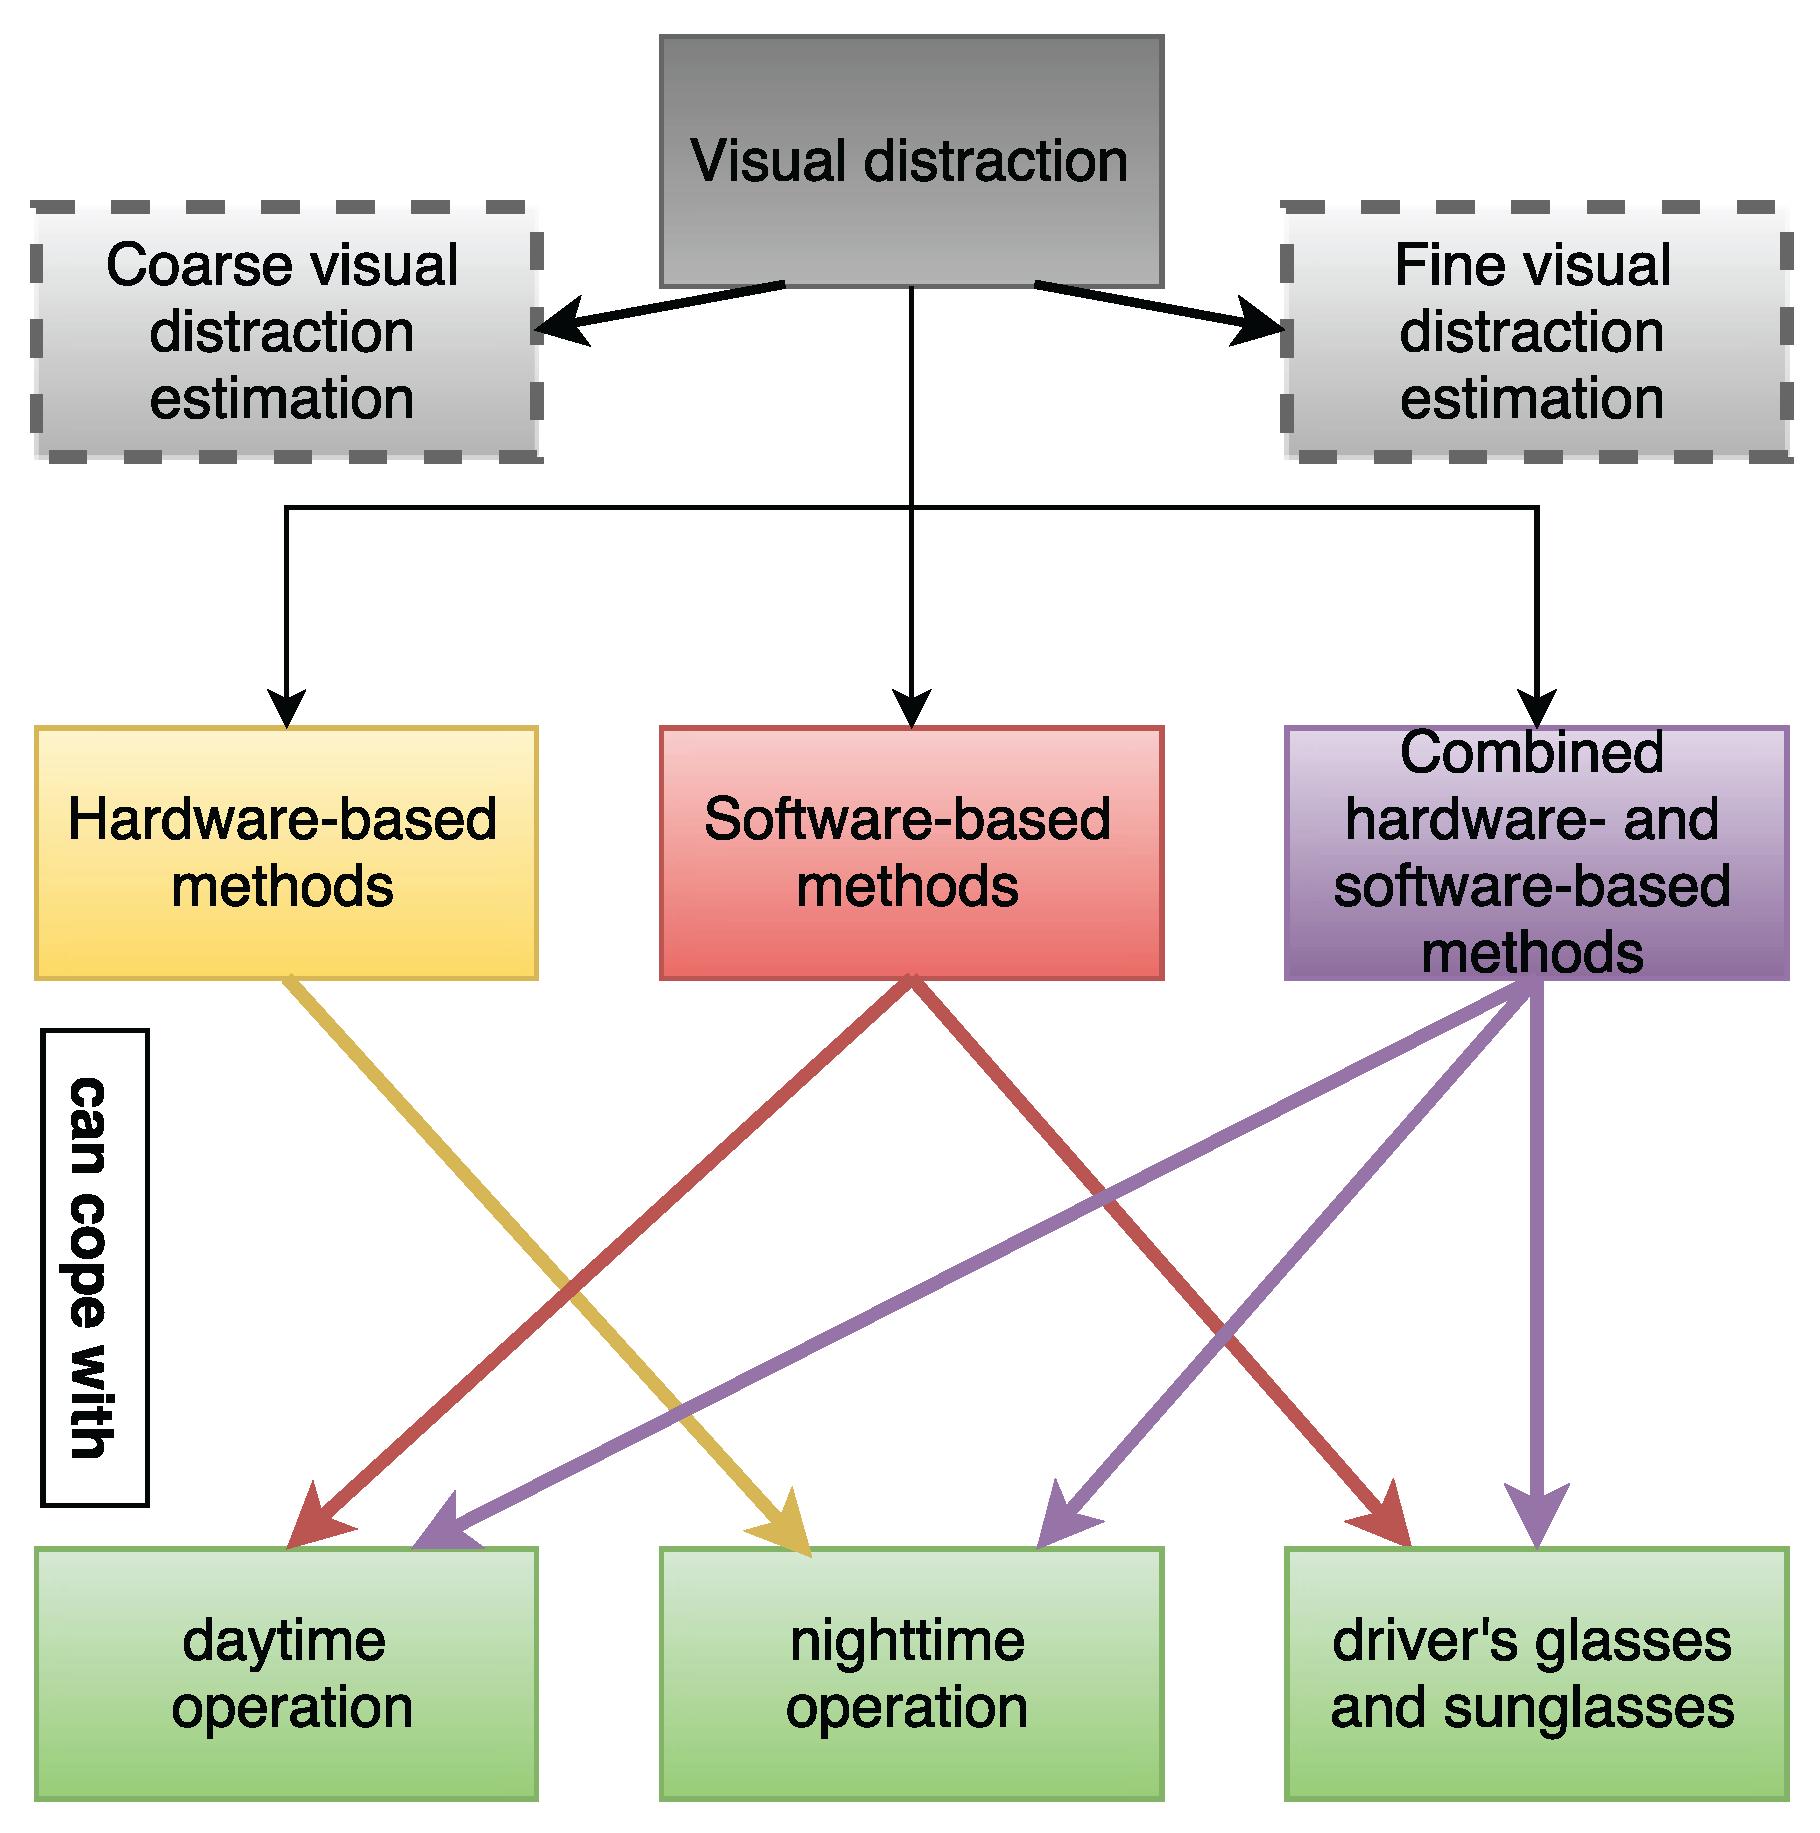 Sensors Free Full Text Driver Distraction Using Visual Based Audible Light Sensor By Ic 741 16 01805 G004